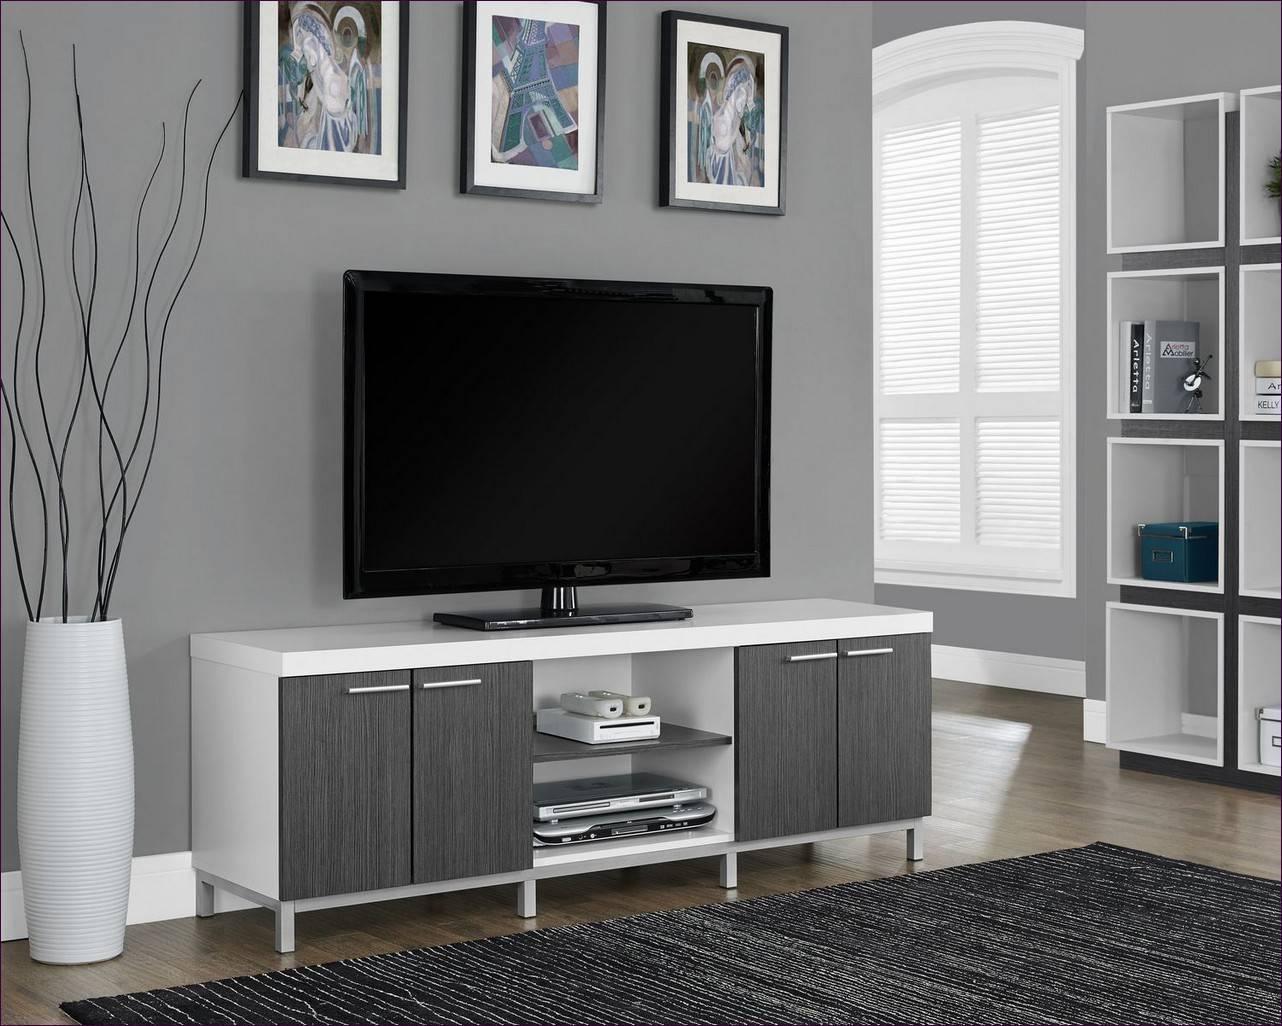 Bedroom : Slim Tv Stand 32 Inch Corner Tv Stand Tall Tv Stand Tv with regard to 24 Inch Tall Tv Stands (Image 3 of 15)